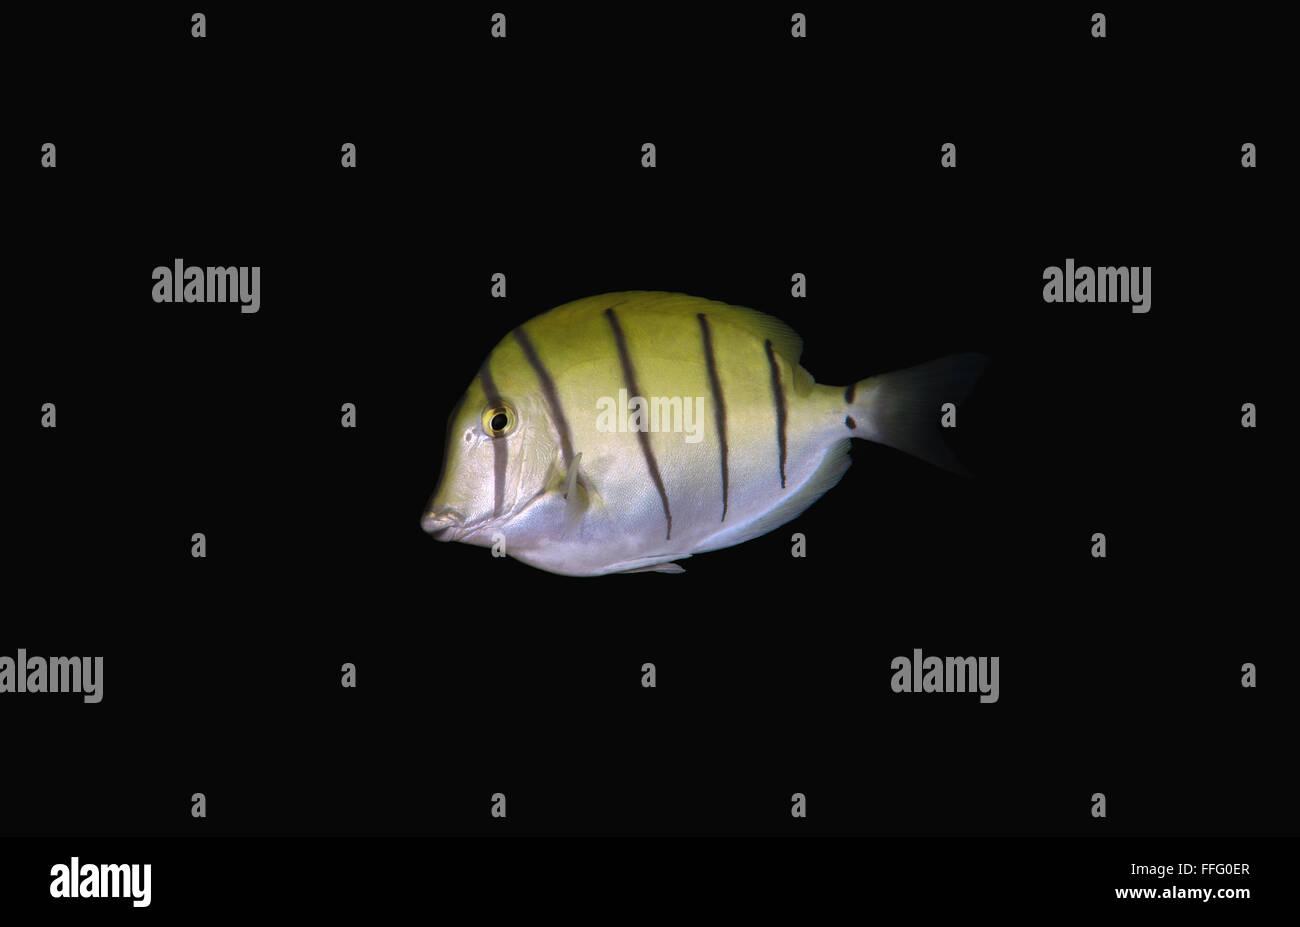 Jan. 31, 2016 - Convict tang, Convict surgeon or Convict surgeonfish (Acanthurus triostegus) Indian Ocean, Hikkaduwa, - Stock Image